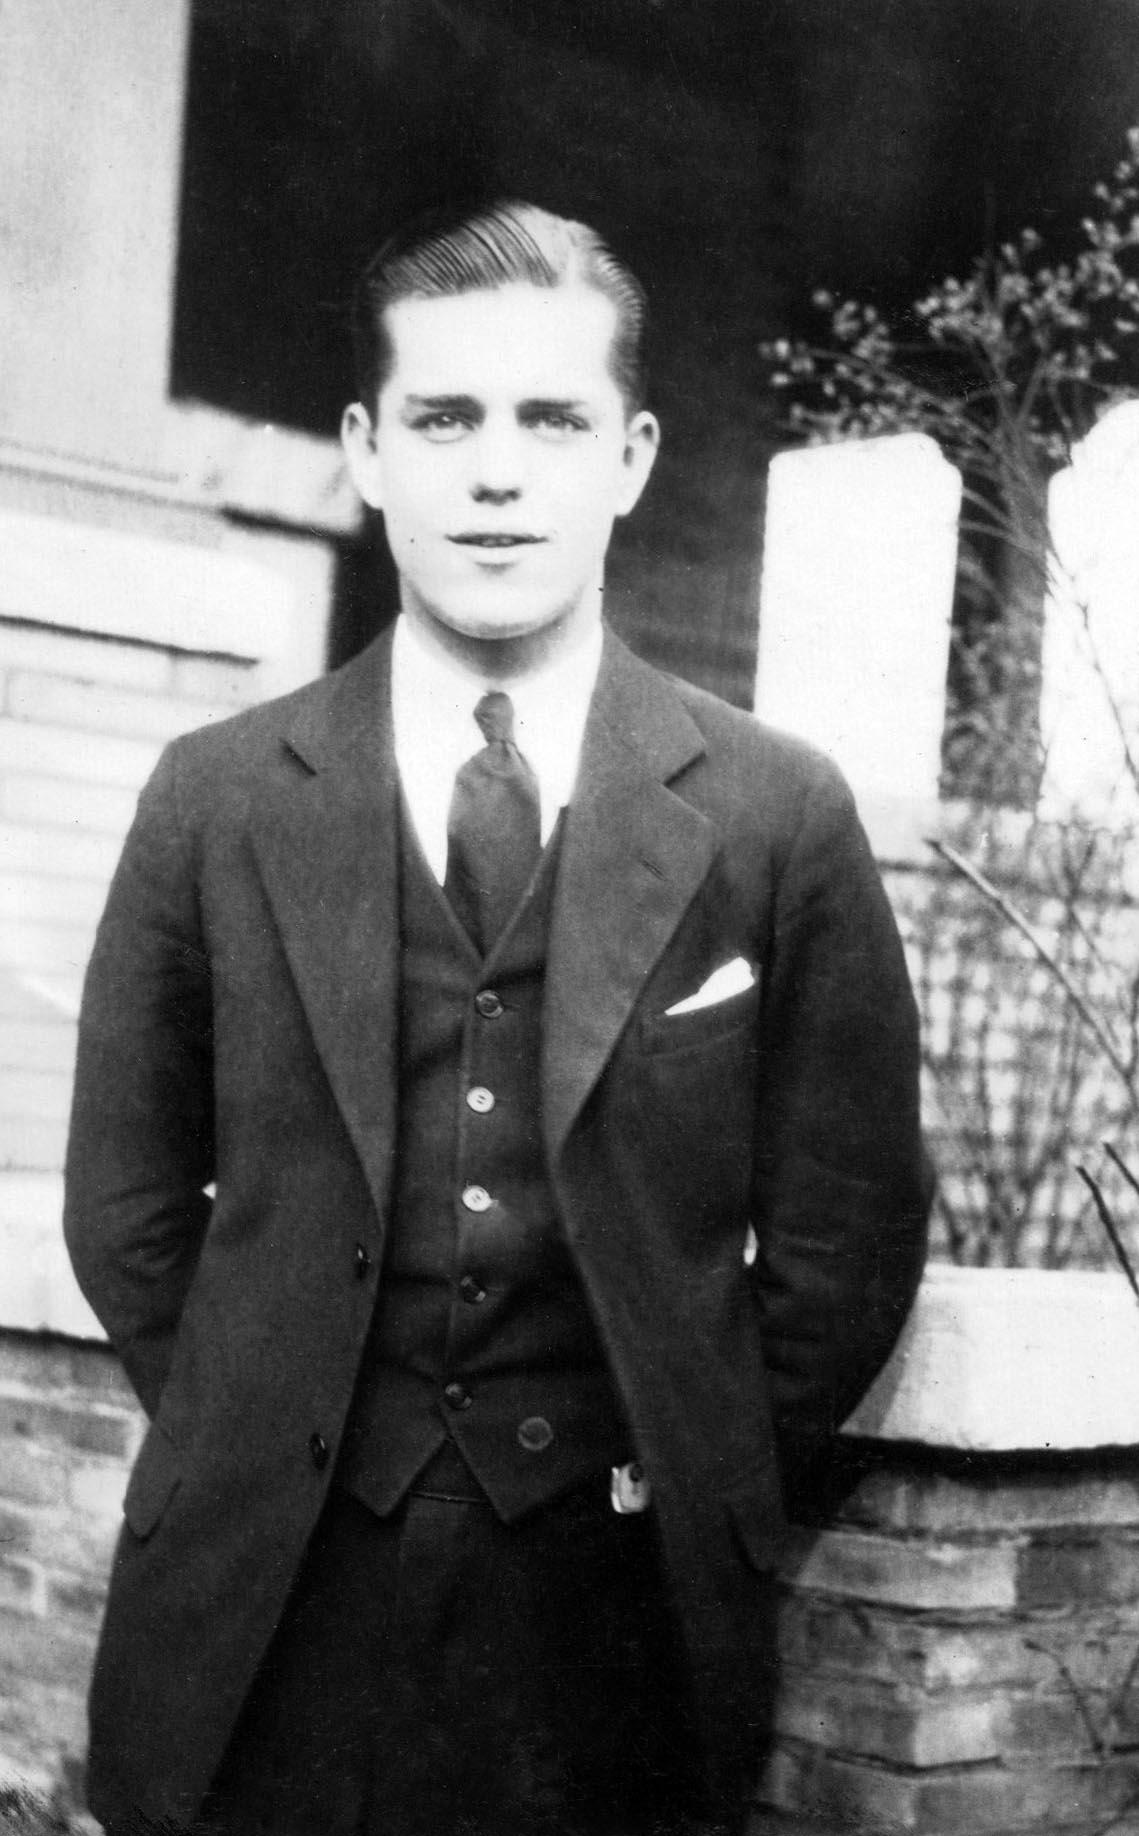 Edward W. White 1932